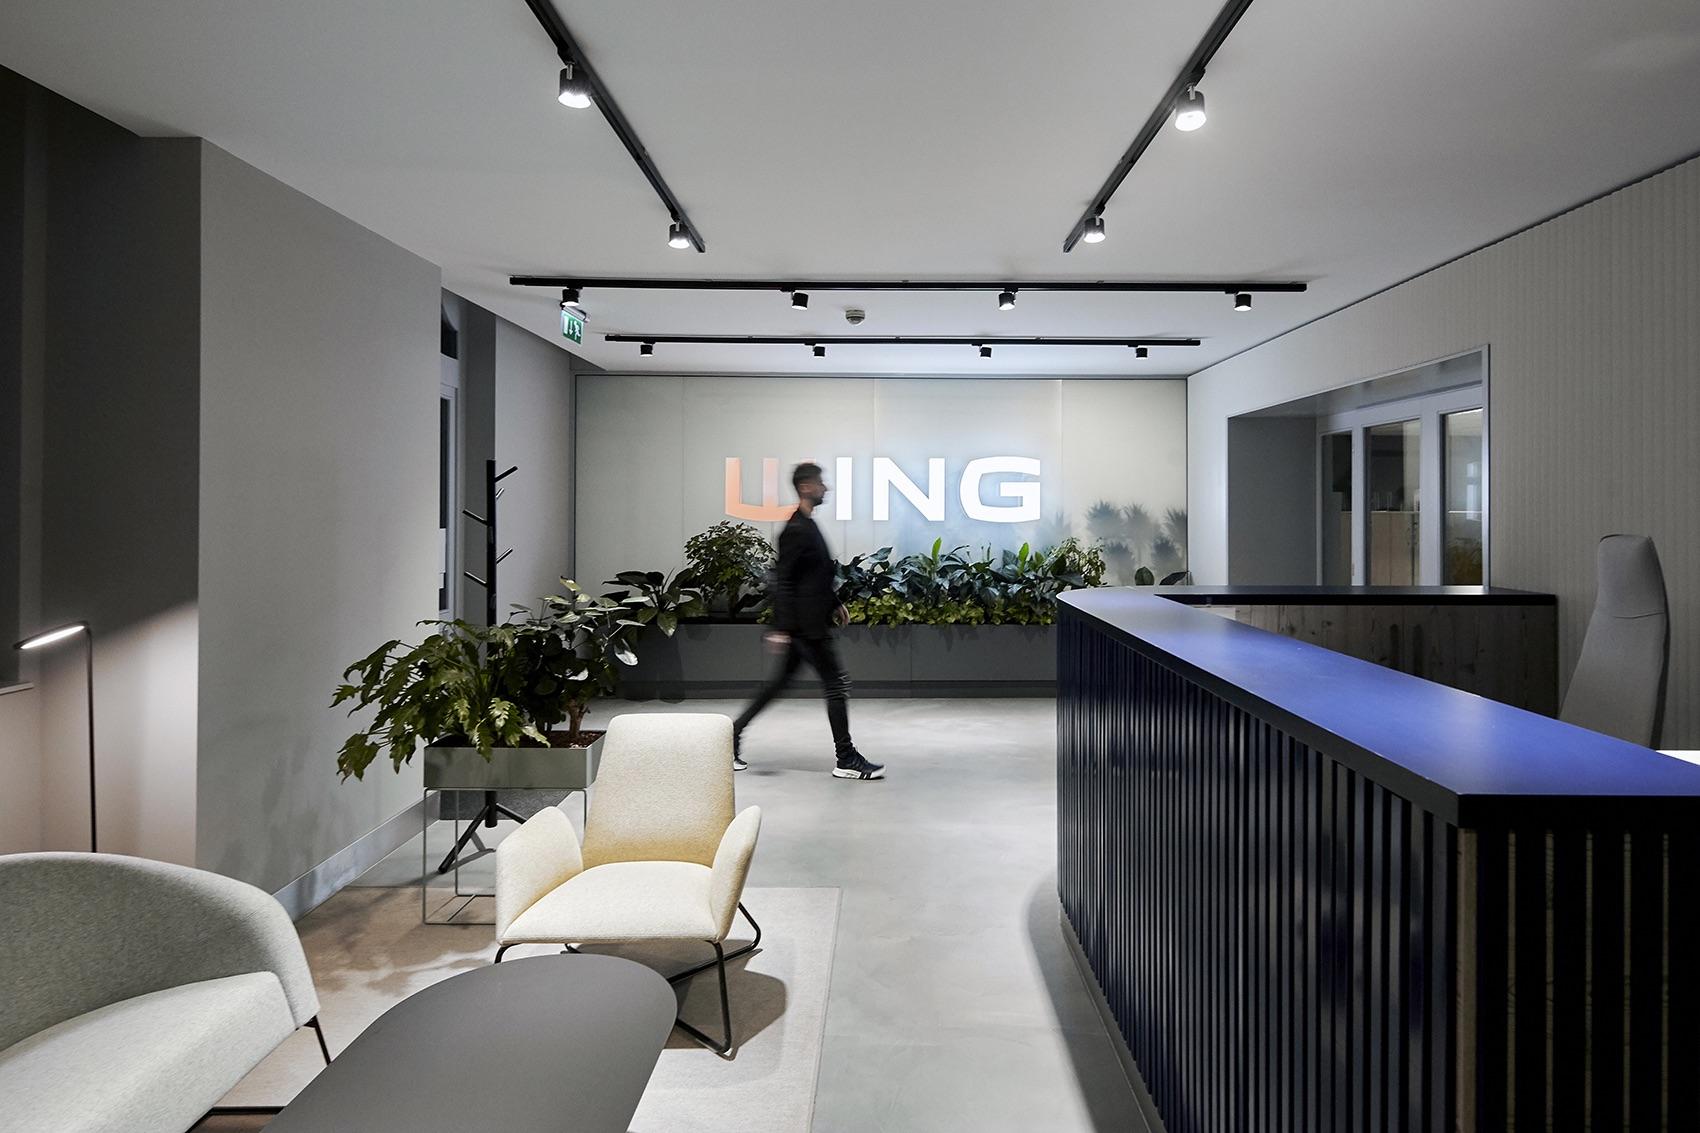 wing-zrt-office-2